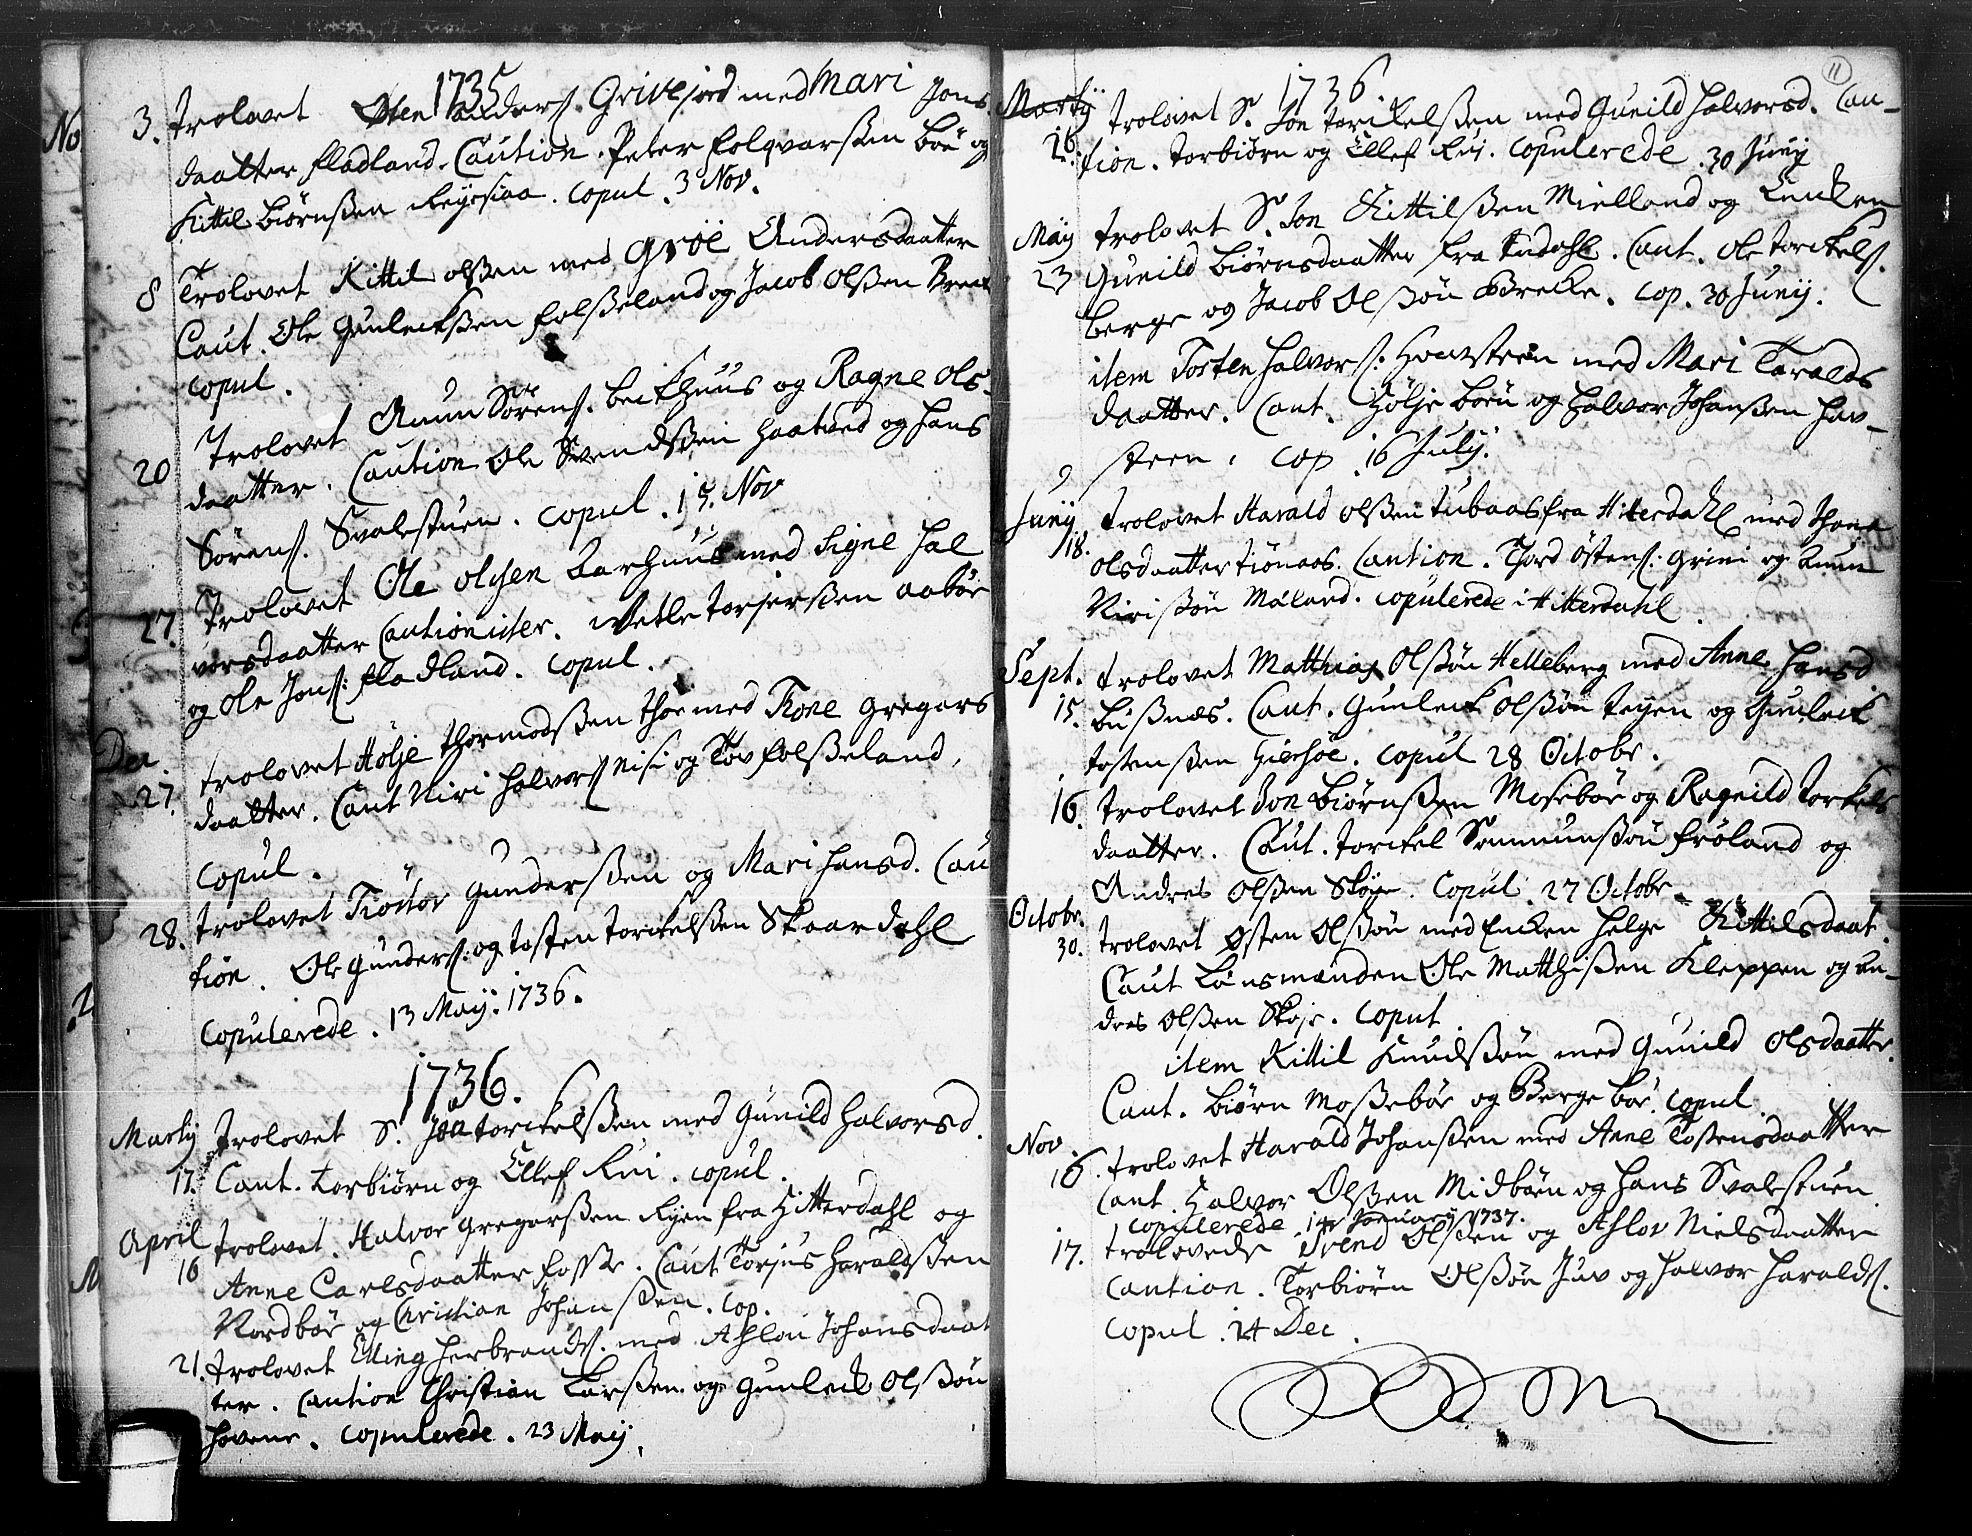 SAKO, Hjartdal kirkebøker, F/Fa/L0004: Ministerialbok nr. I 4, 1727-1795, s. 11